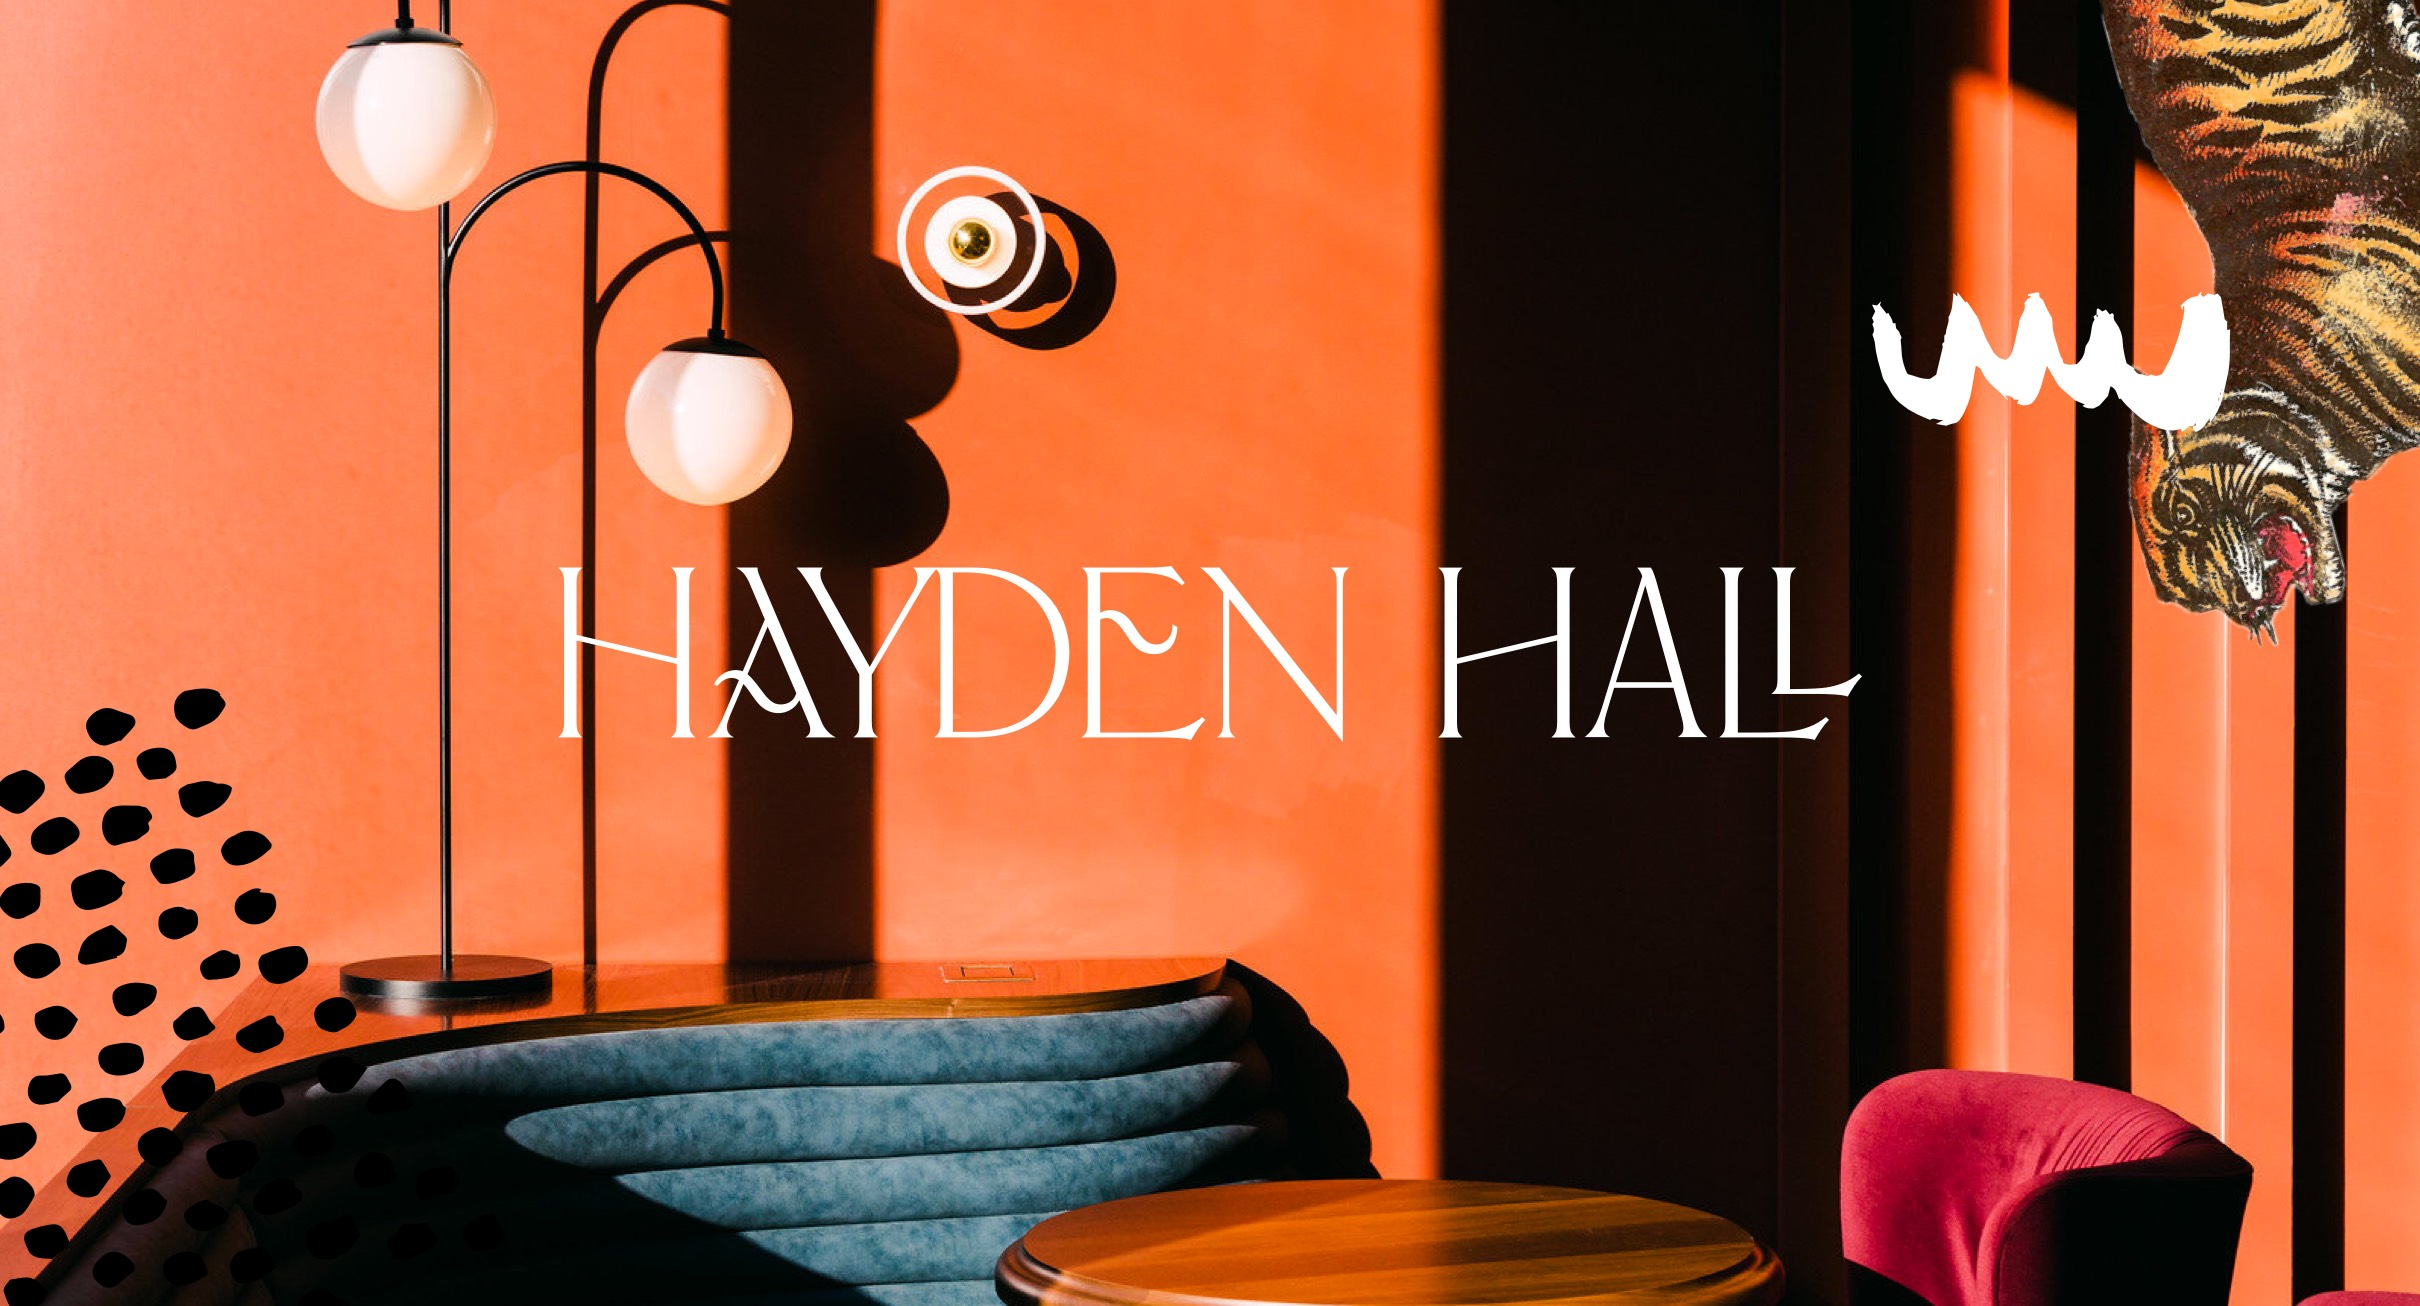 Hayden Hall